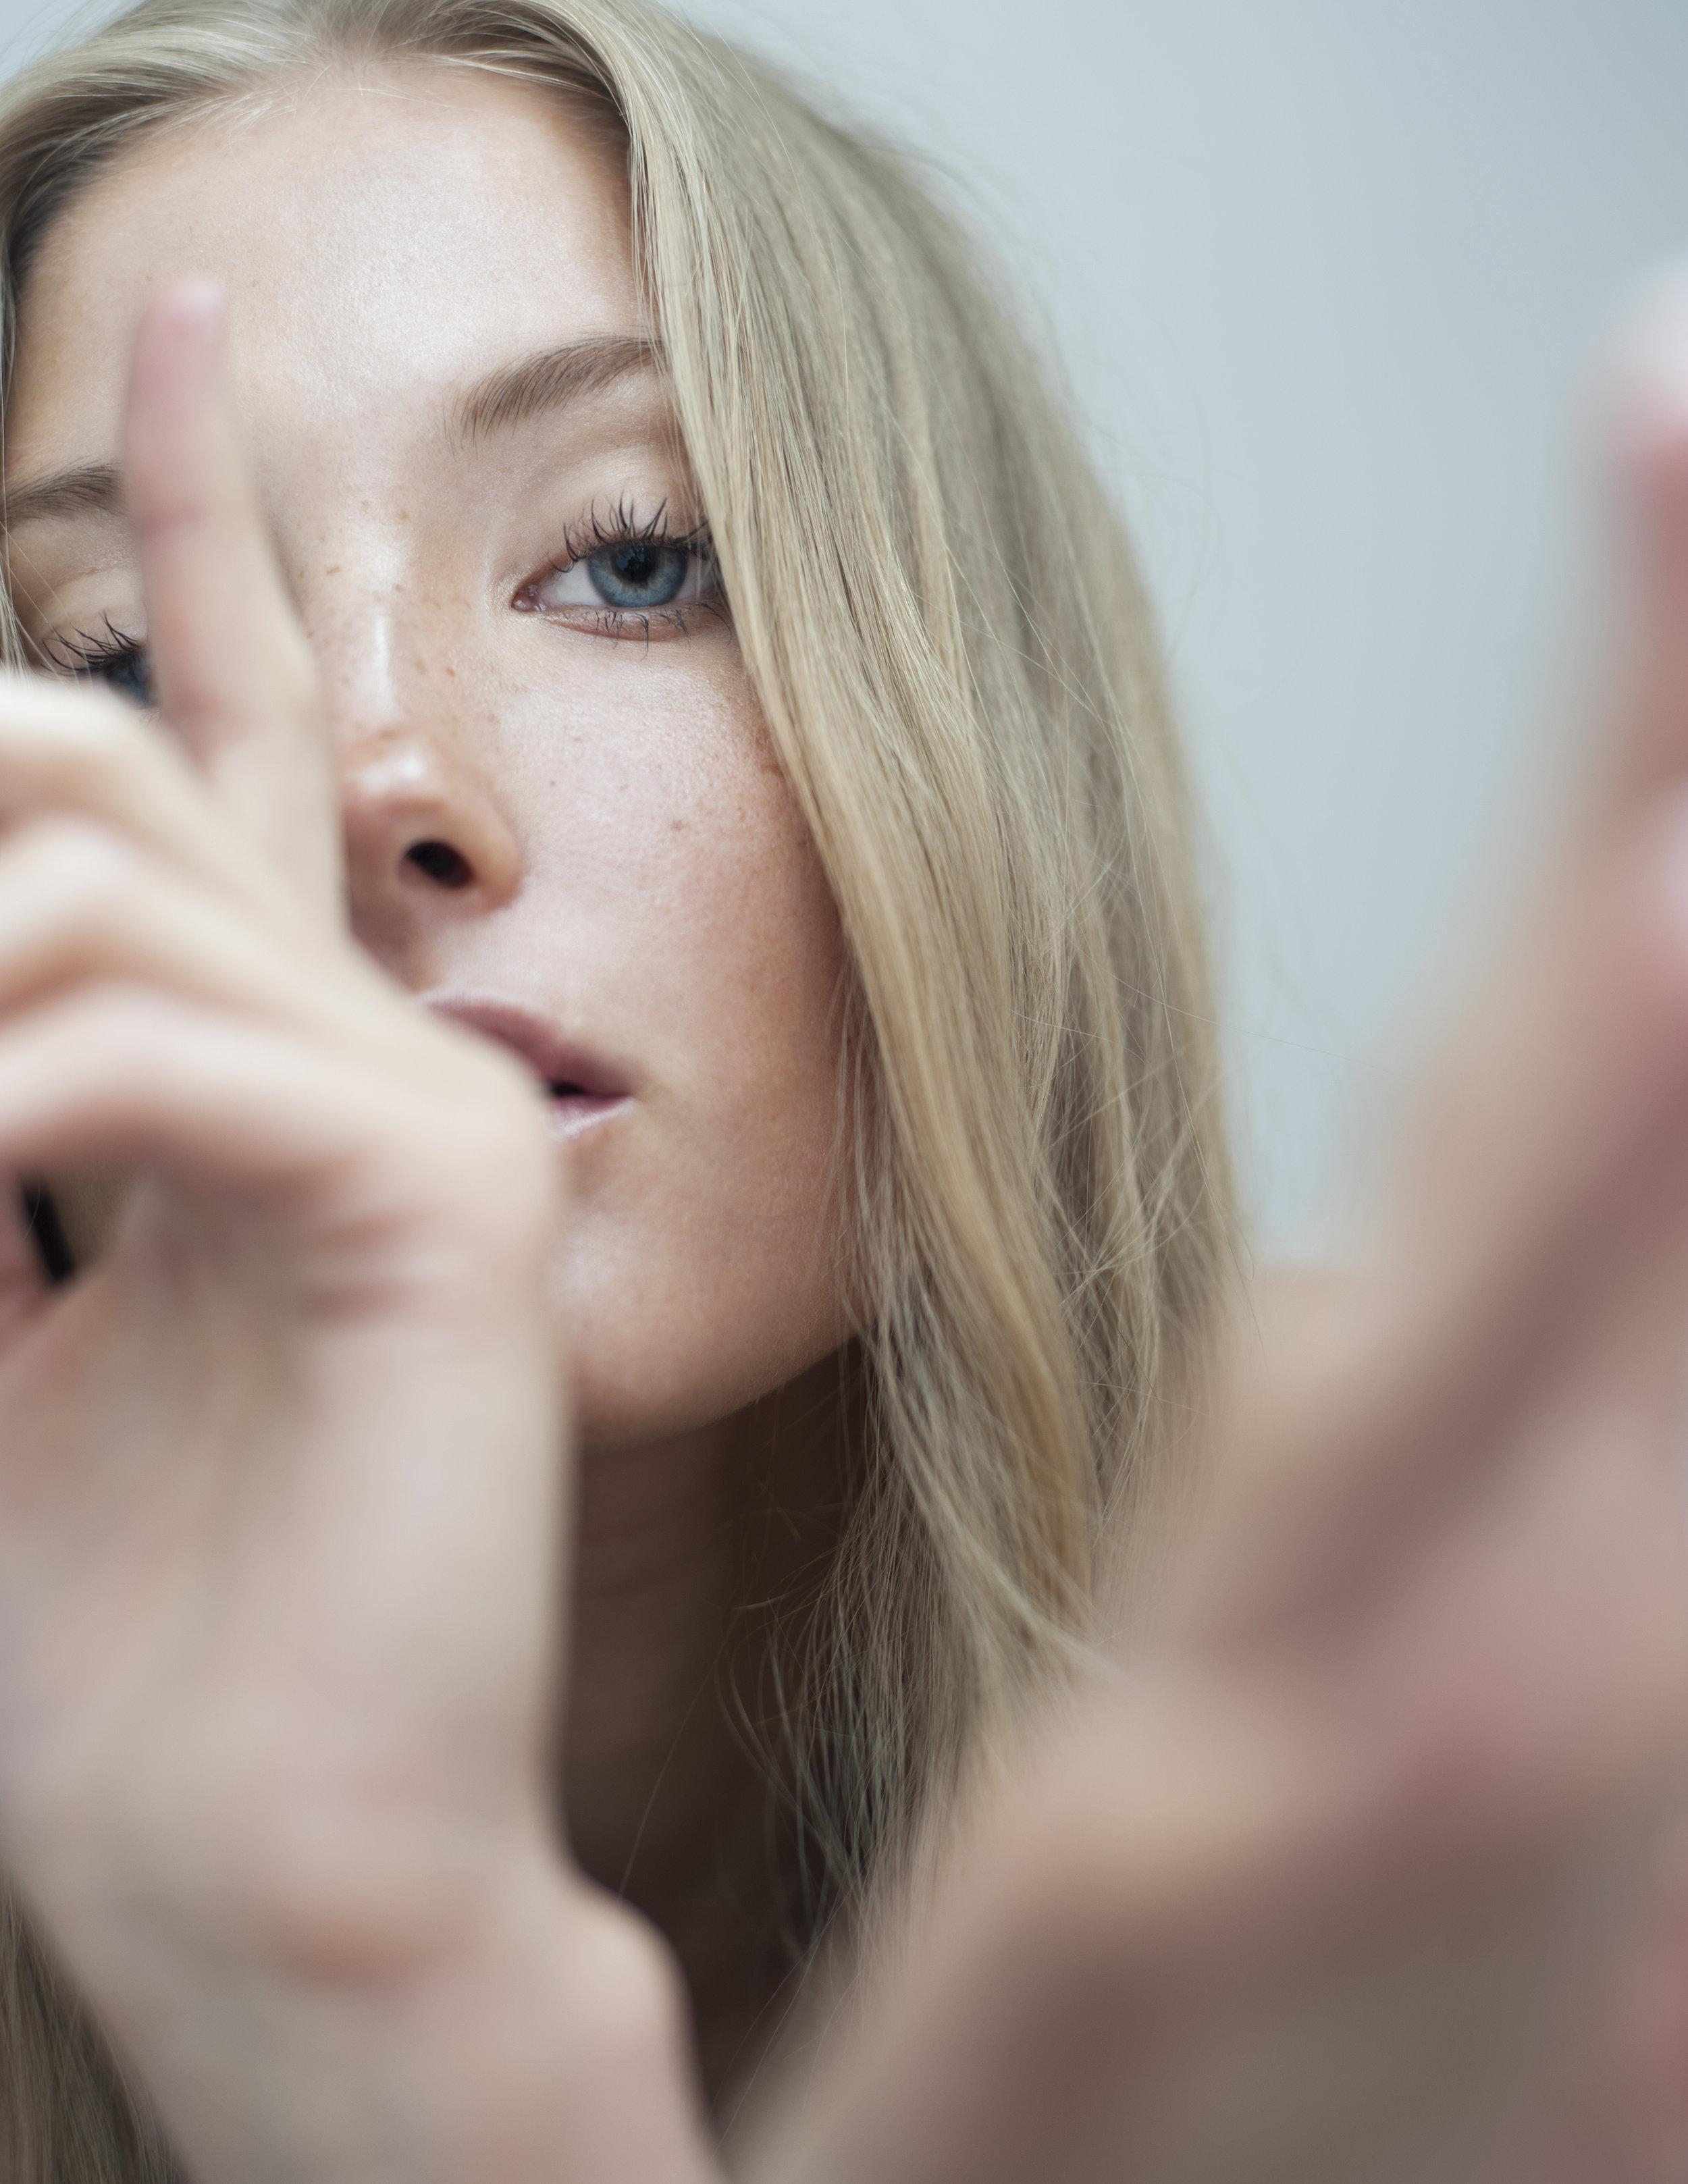 Photography by Taryn Rae-Lee. Hair by Kristine Cimbule